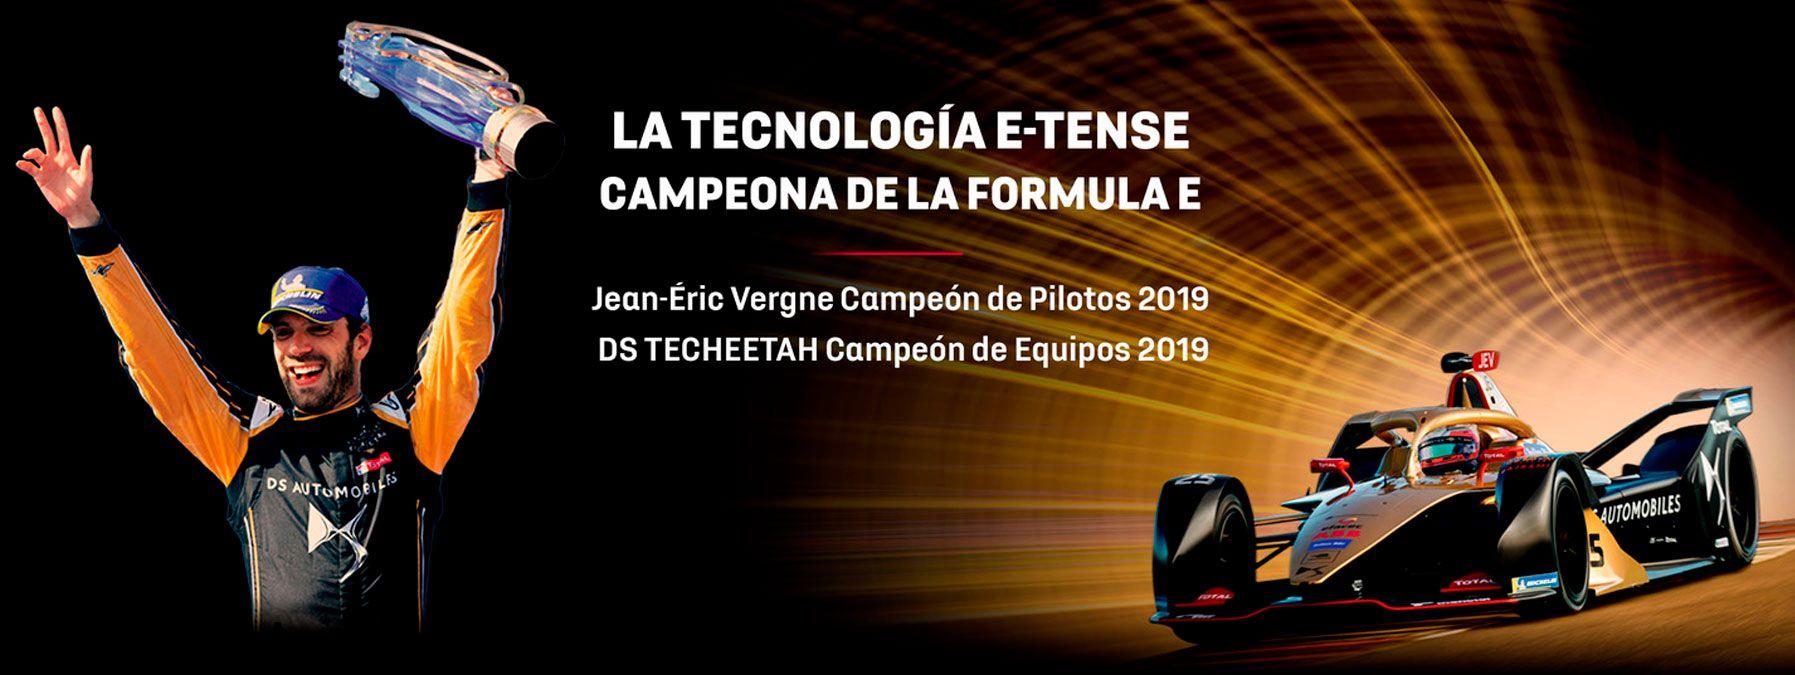 LA TECNOLOGÍA E-TENSE CAMPEONA DE LA FORMULA E